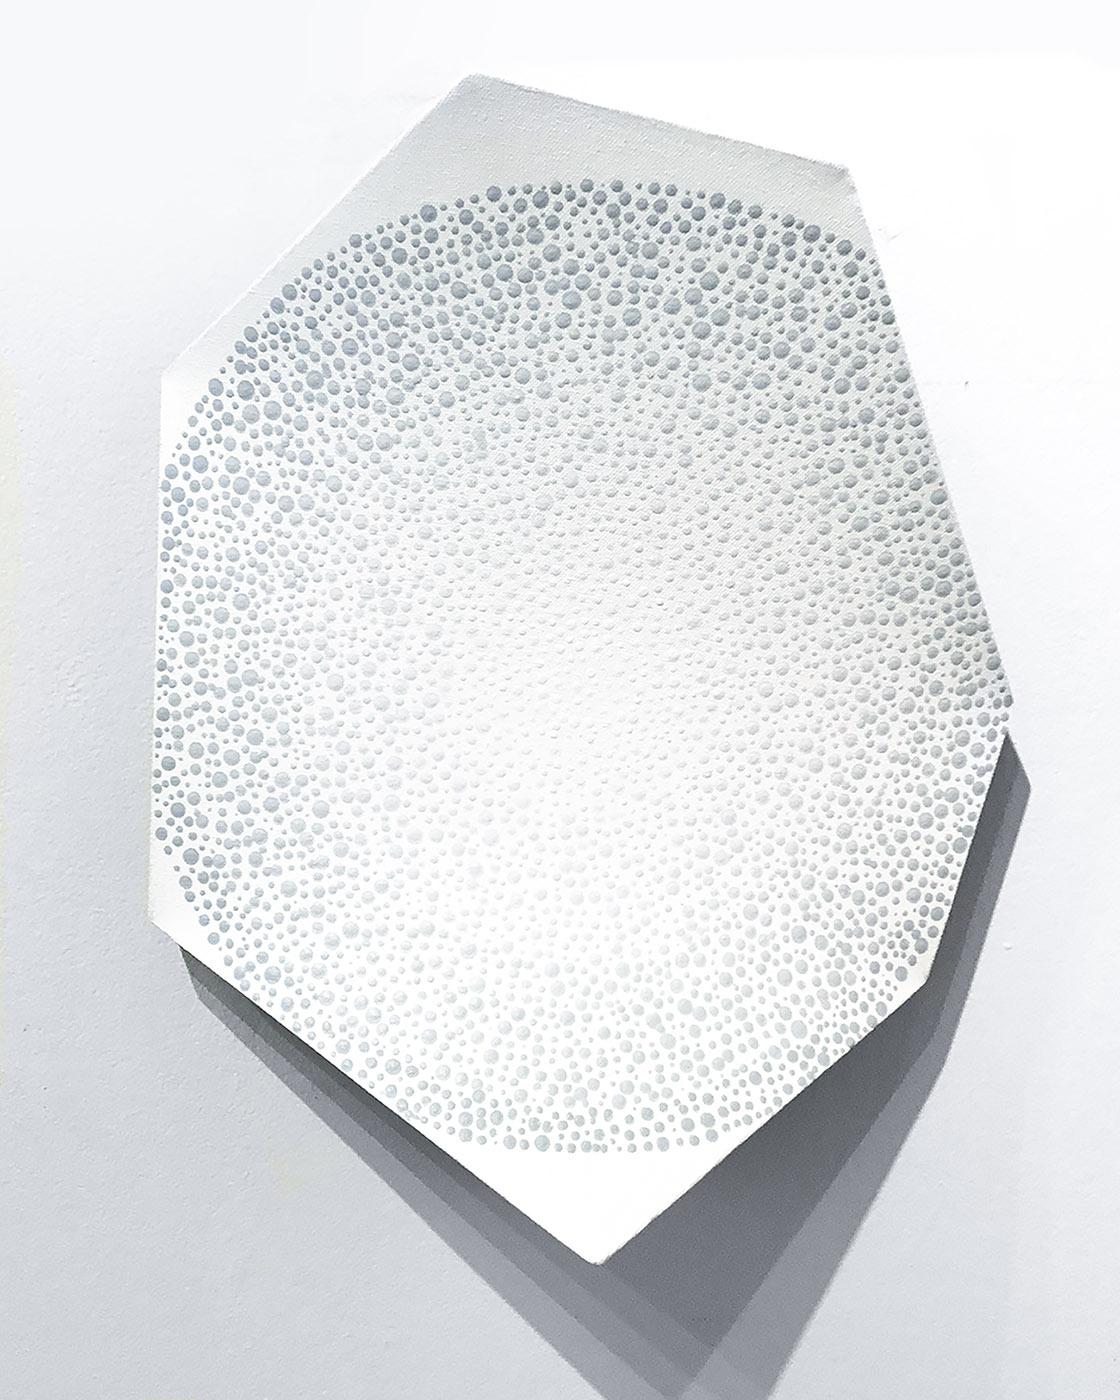 'Stable for Us' - AJ Oishi at Kostuik Gallery